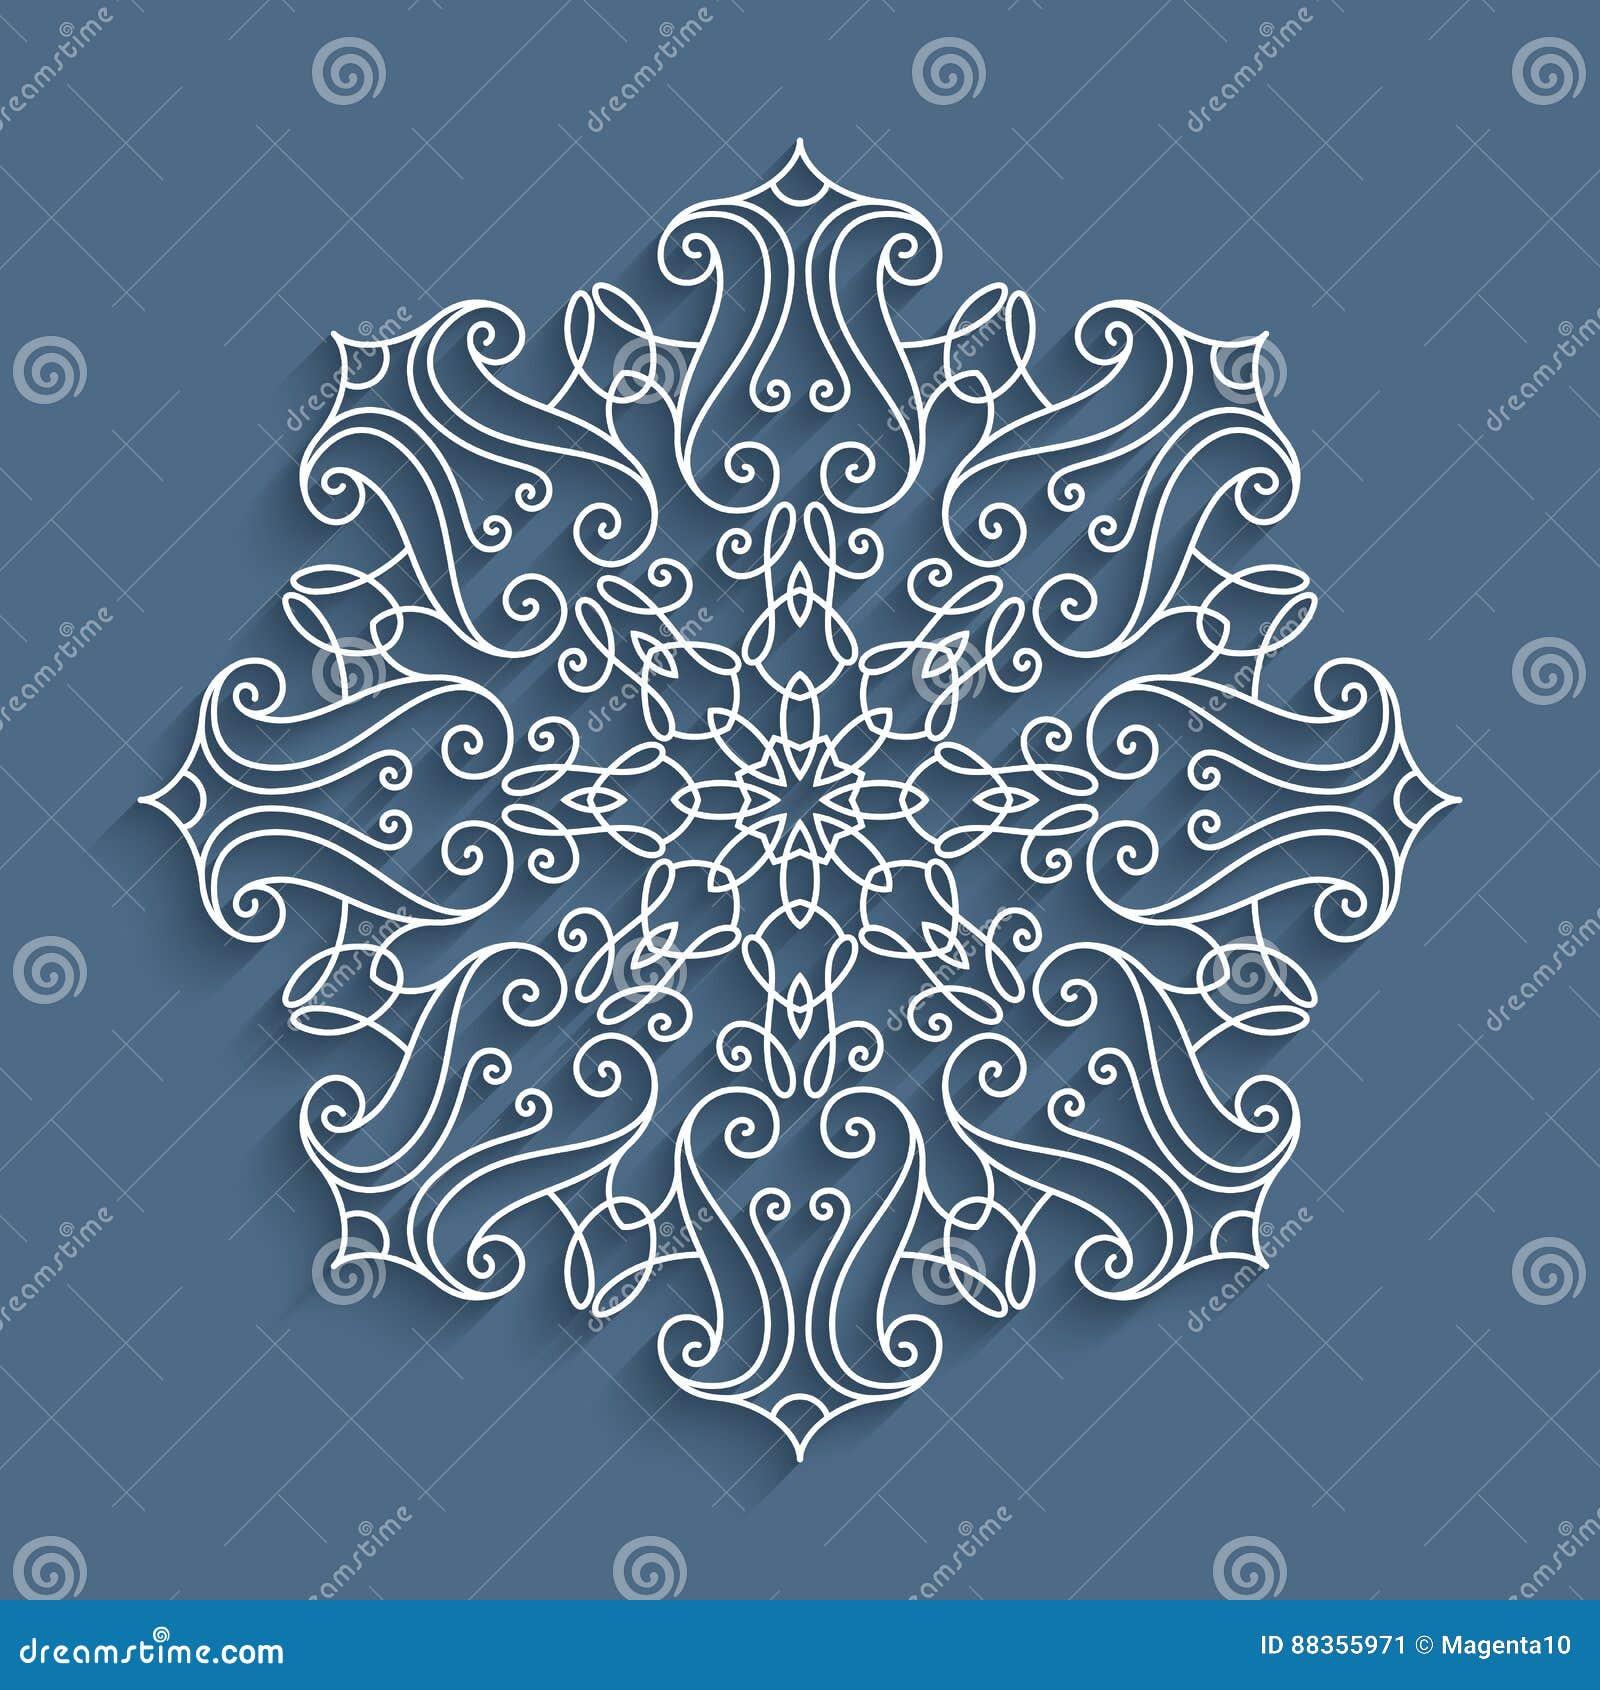 Paper Lace Doily Round Crochet Pattern Stock Vector Illustration